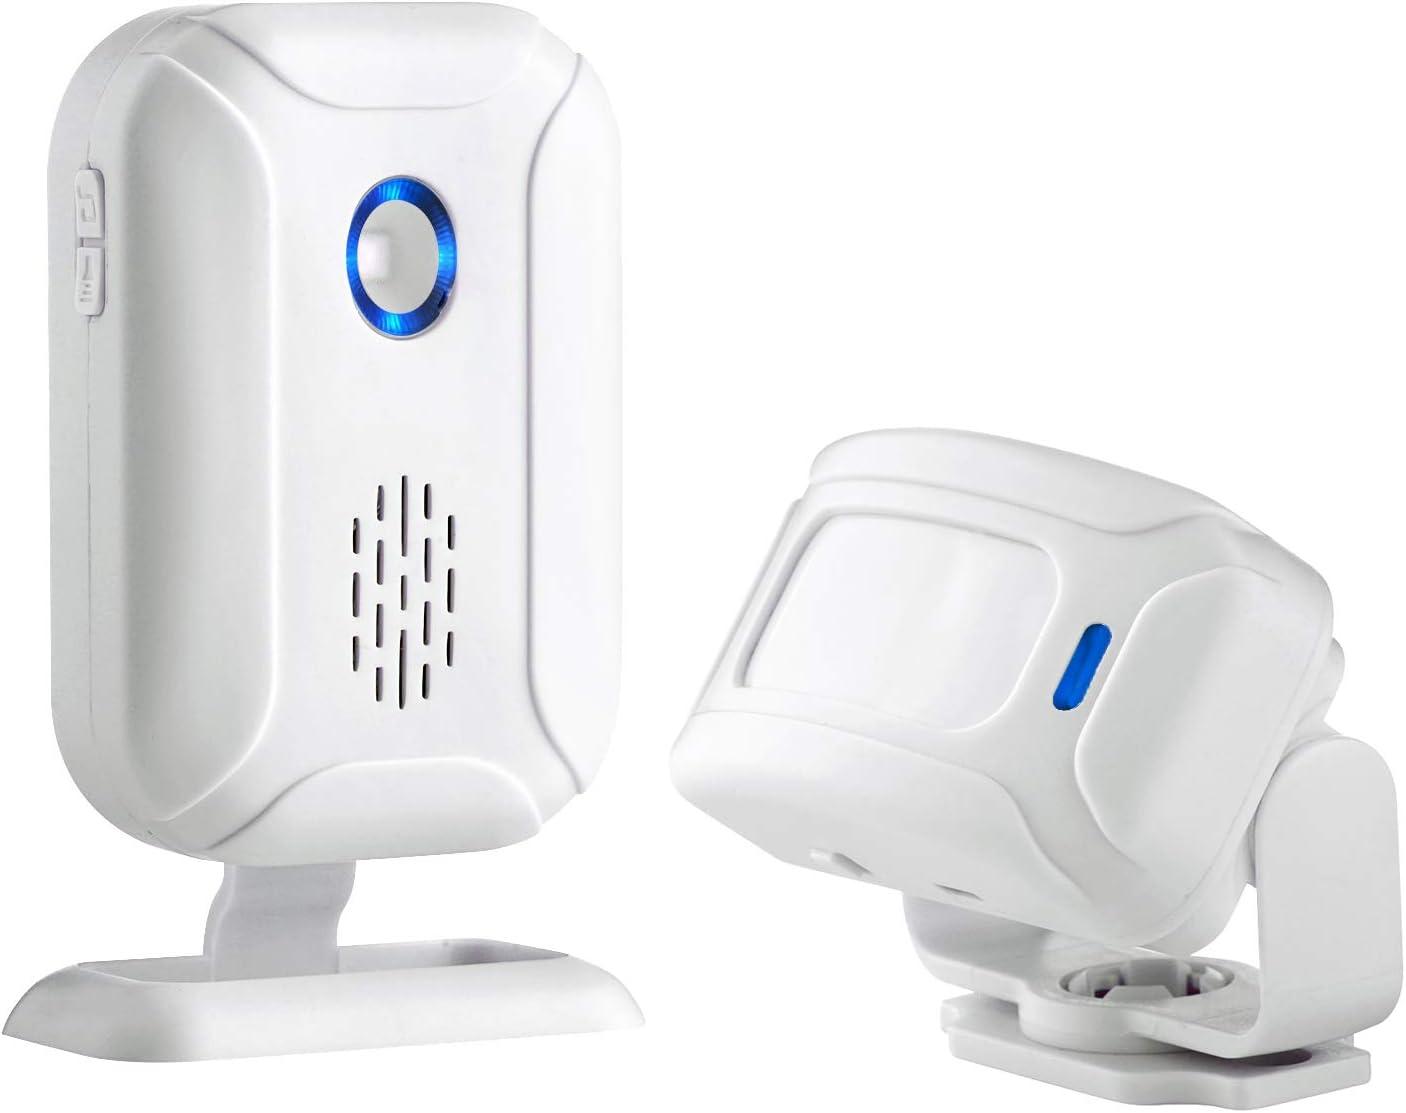 Motion Sensor Doorbell, Door Chime for Business Entry, Store Welcome Buzzer Monitor,Motion Sensor Detect Alarm, Caregiver Reminder for Elderly, Visitor Bell